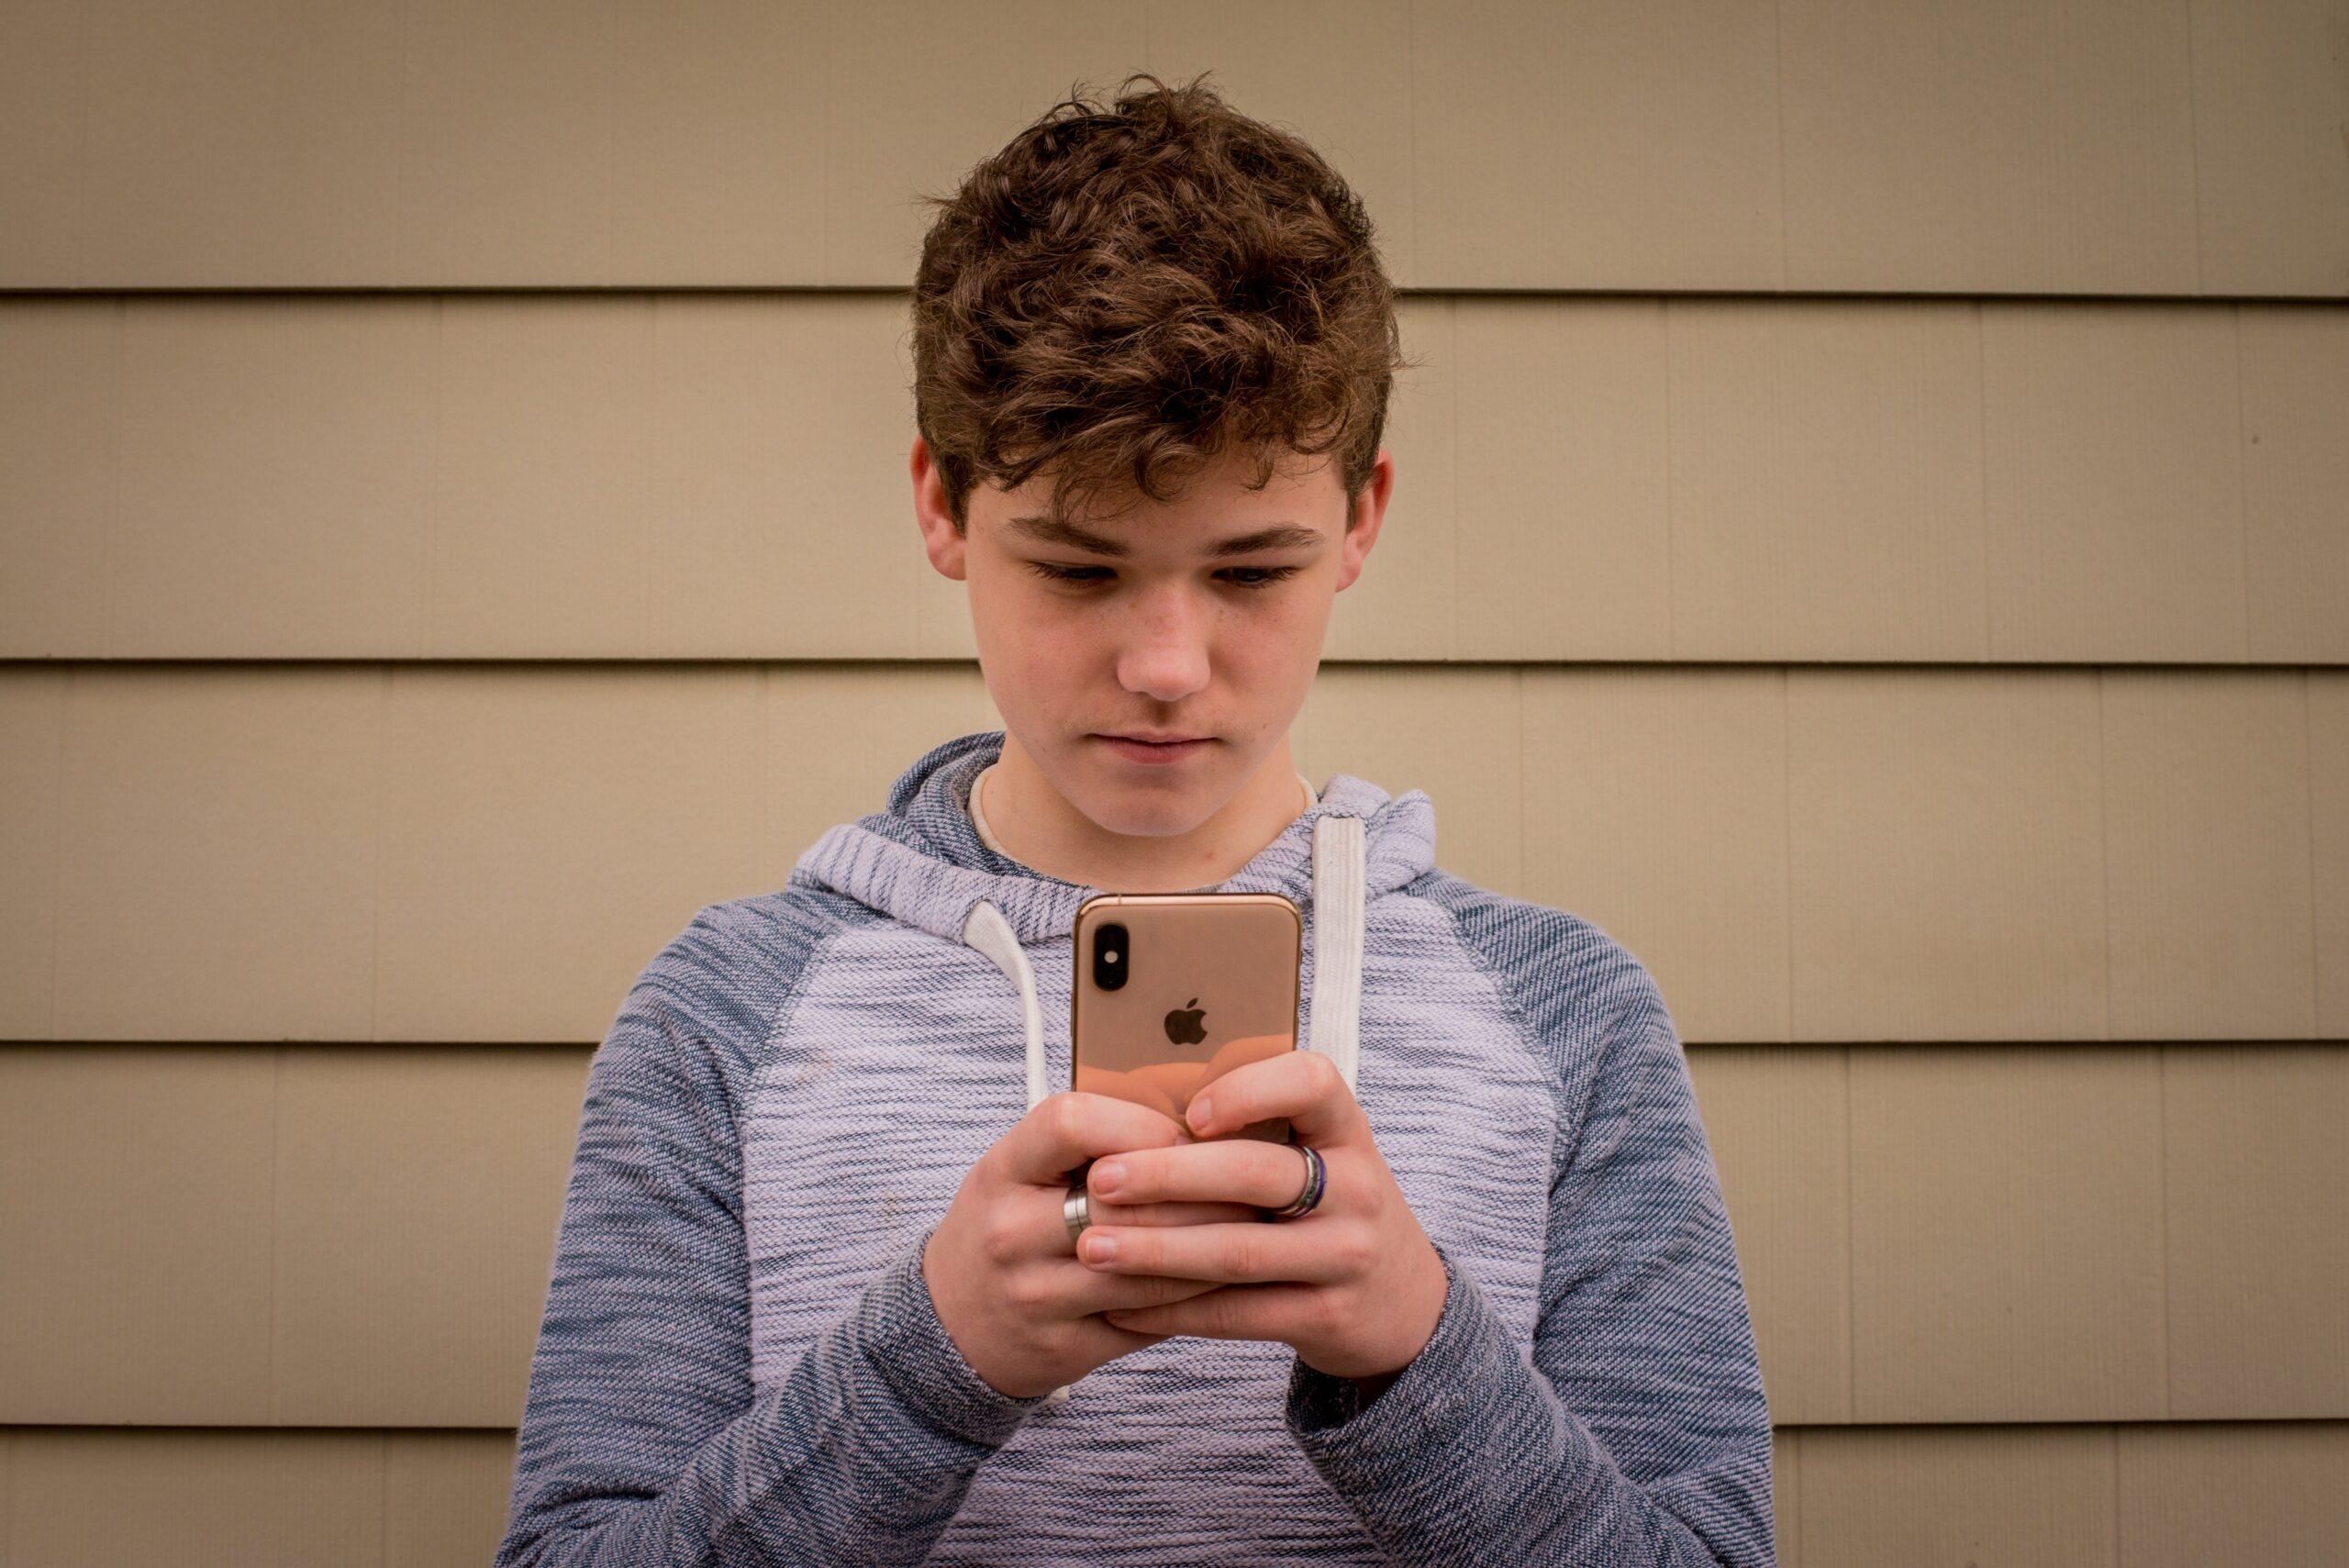 Adolescente usando iPhone